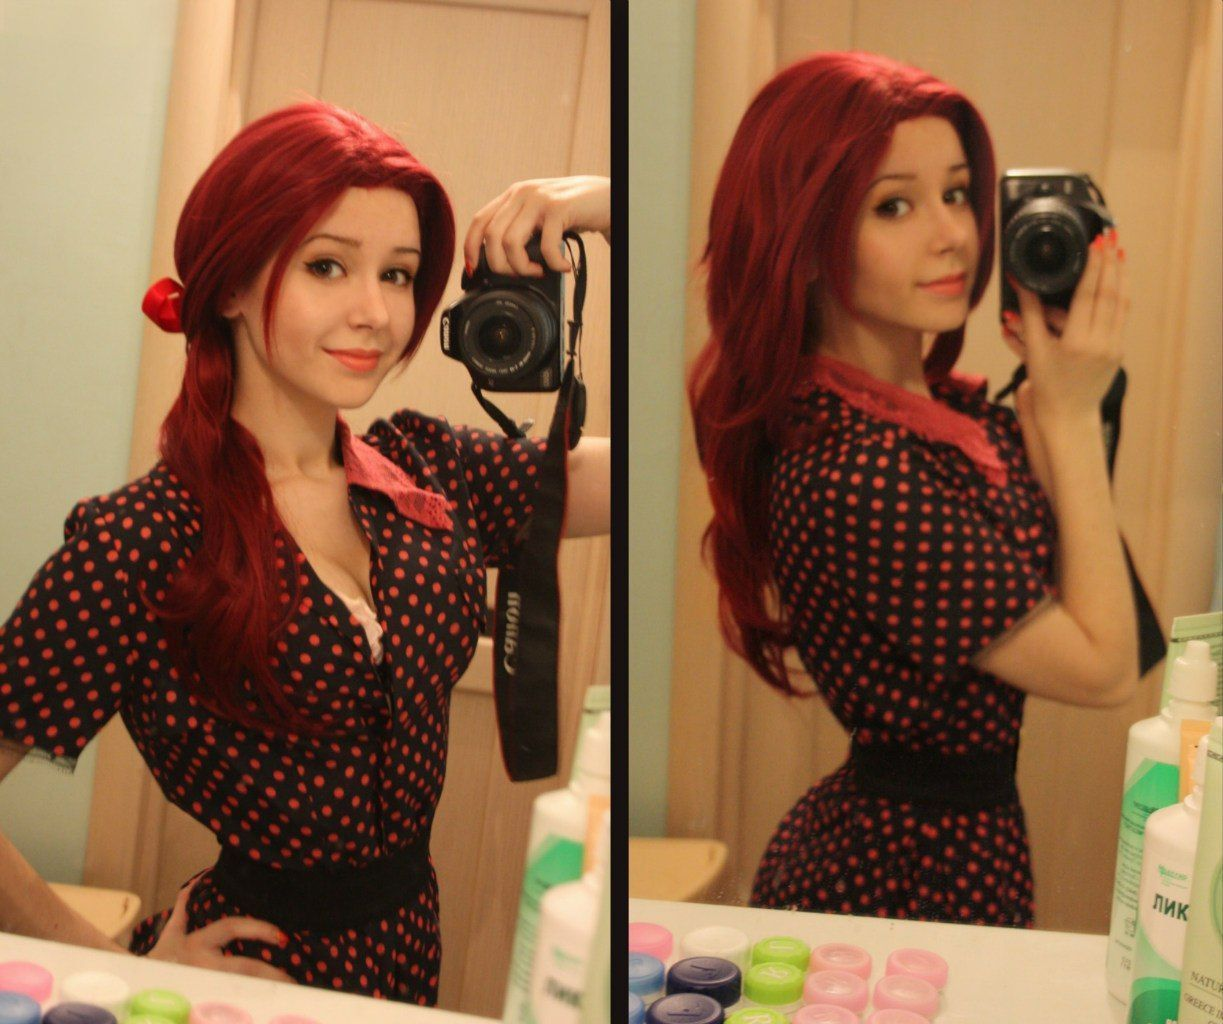 Naughty plump redhead